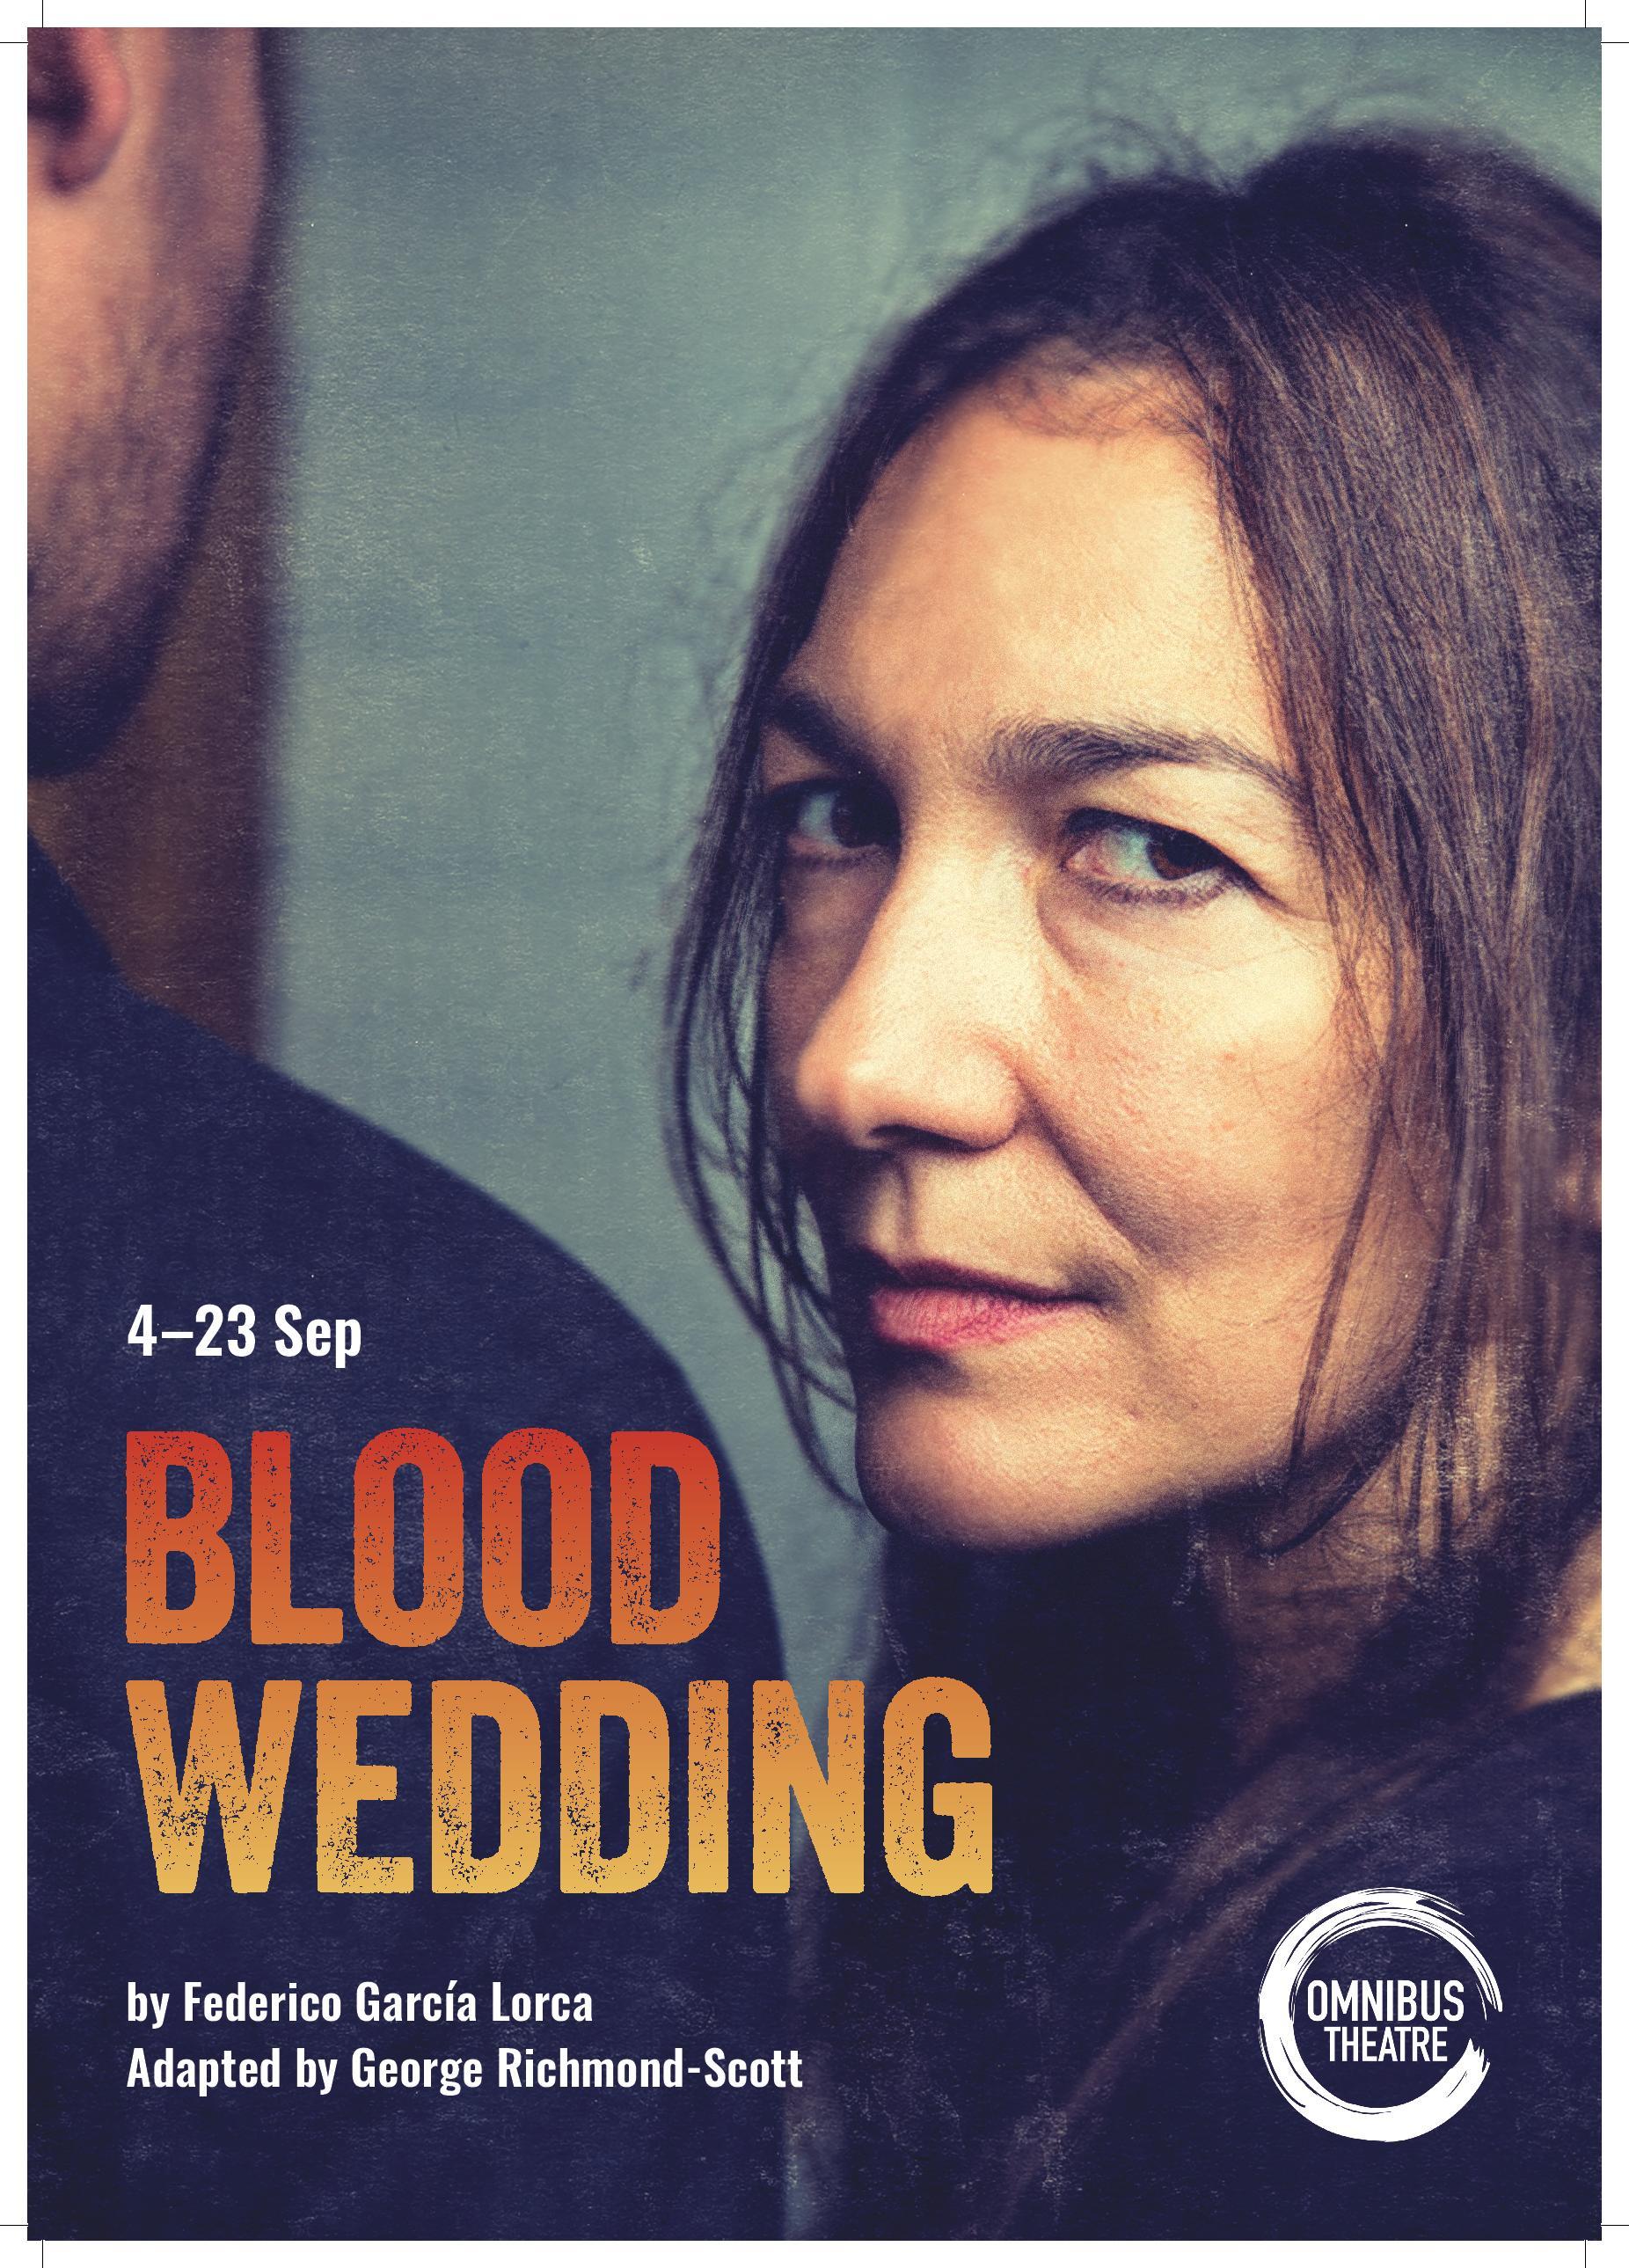 blood-wedding-A3-print-page-001.jpg